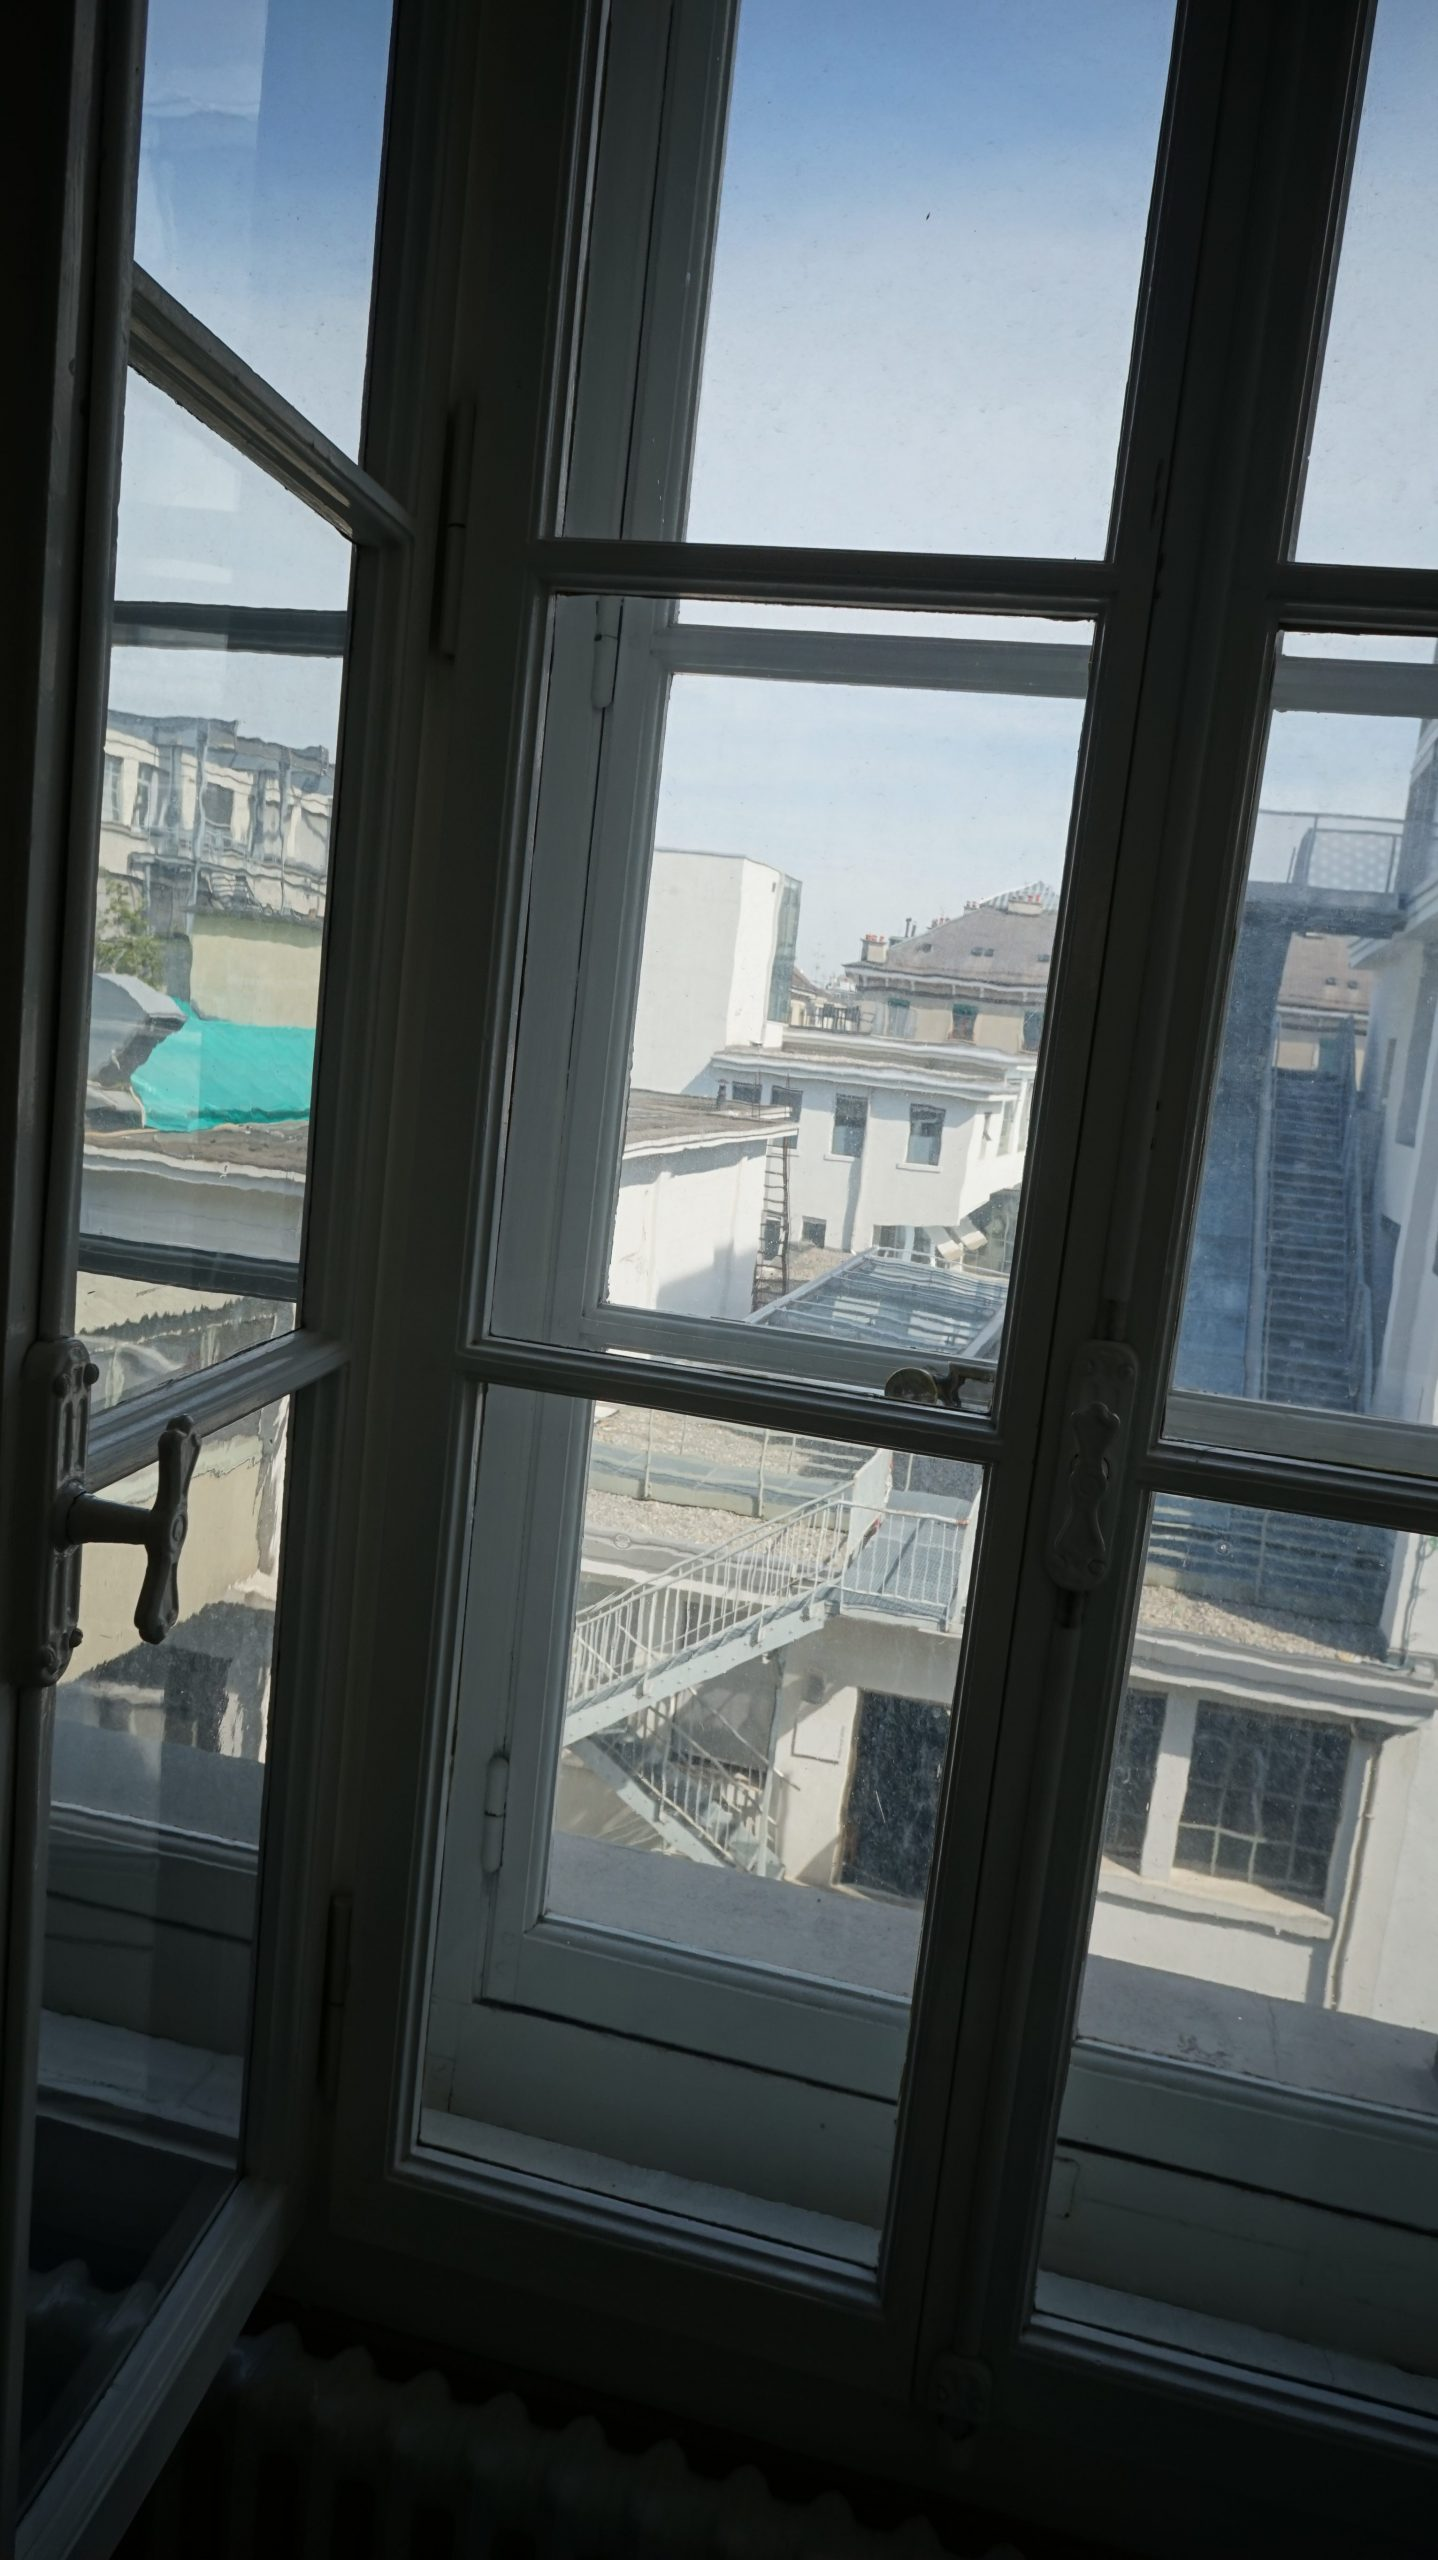 BY THE WINDOW GENEVA